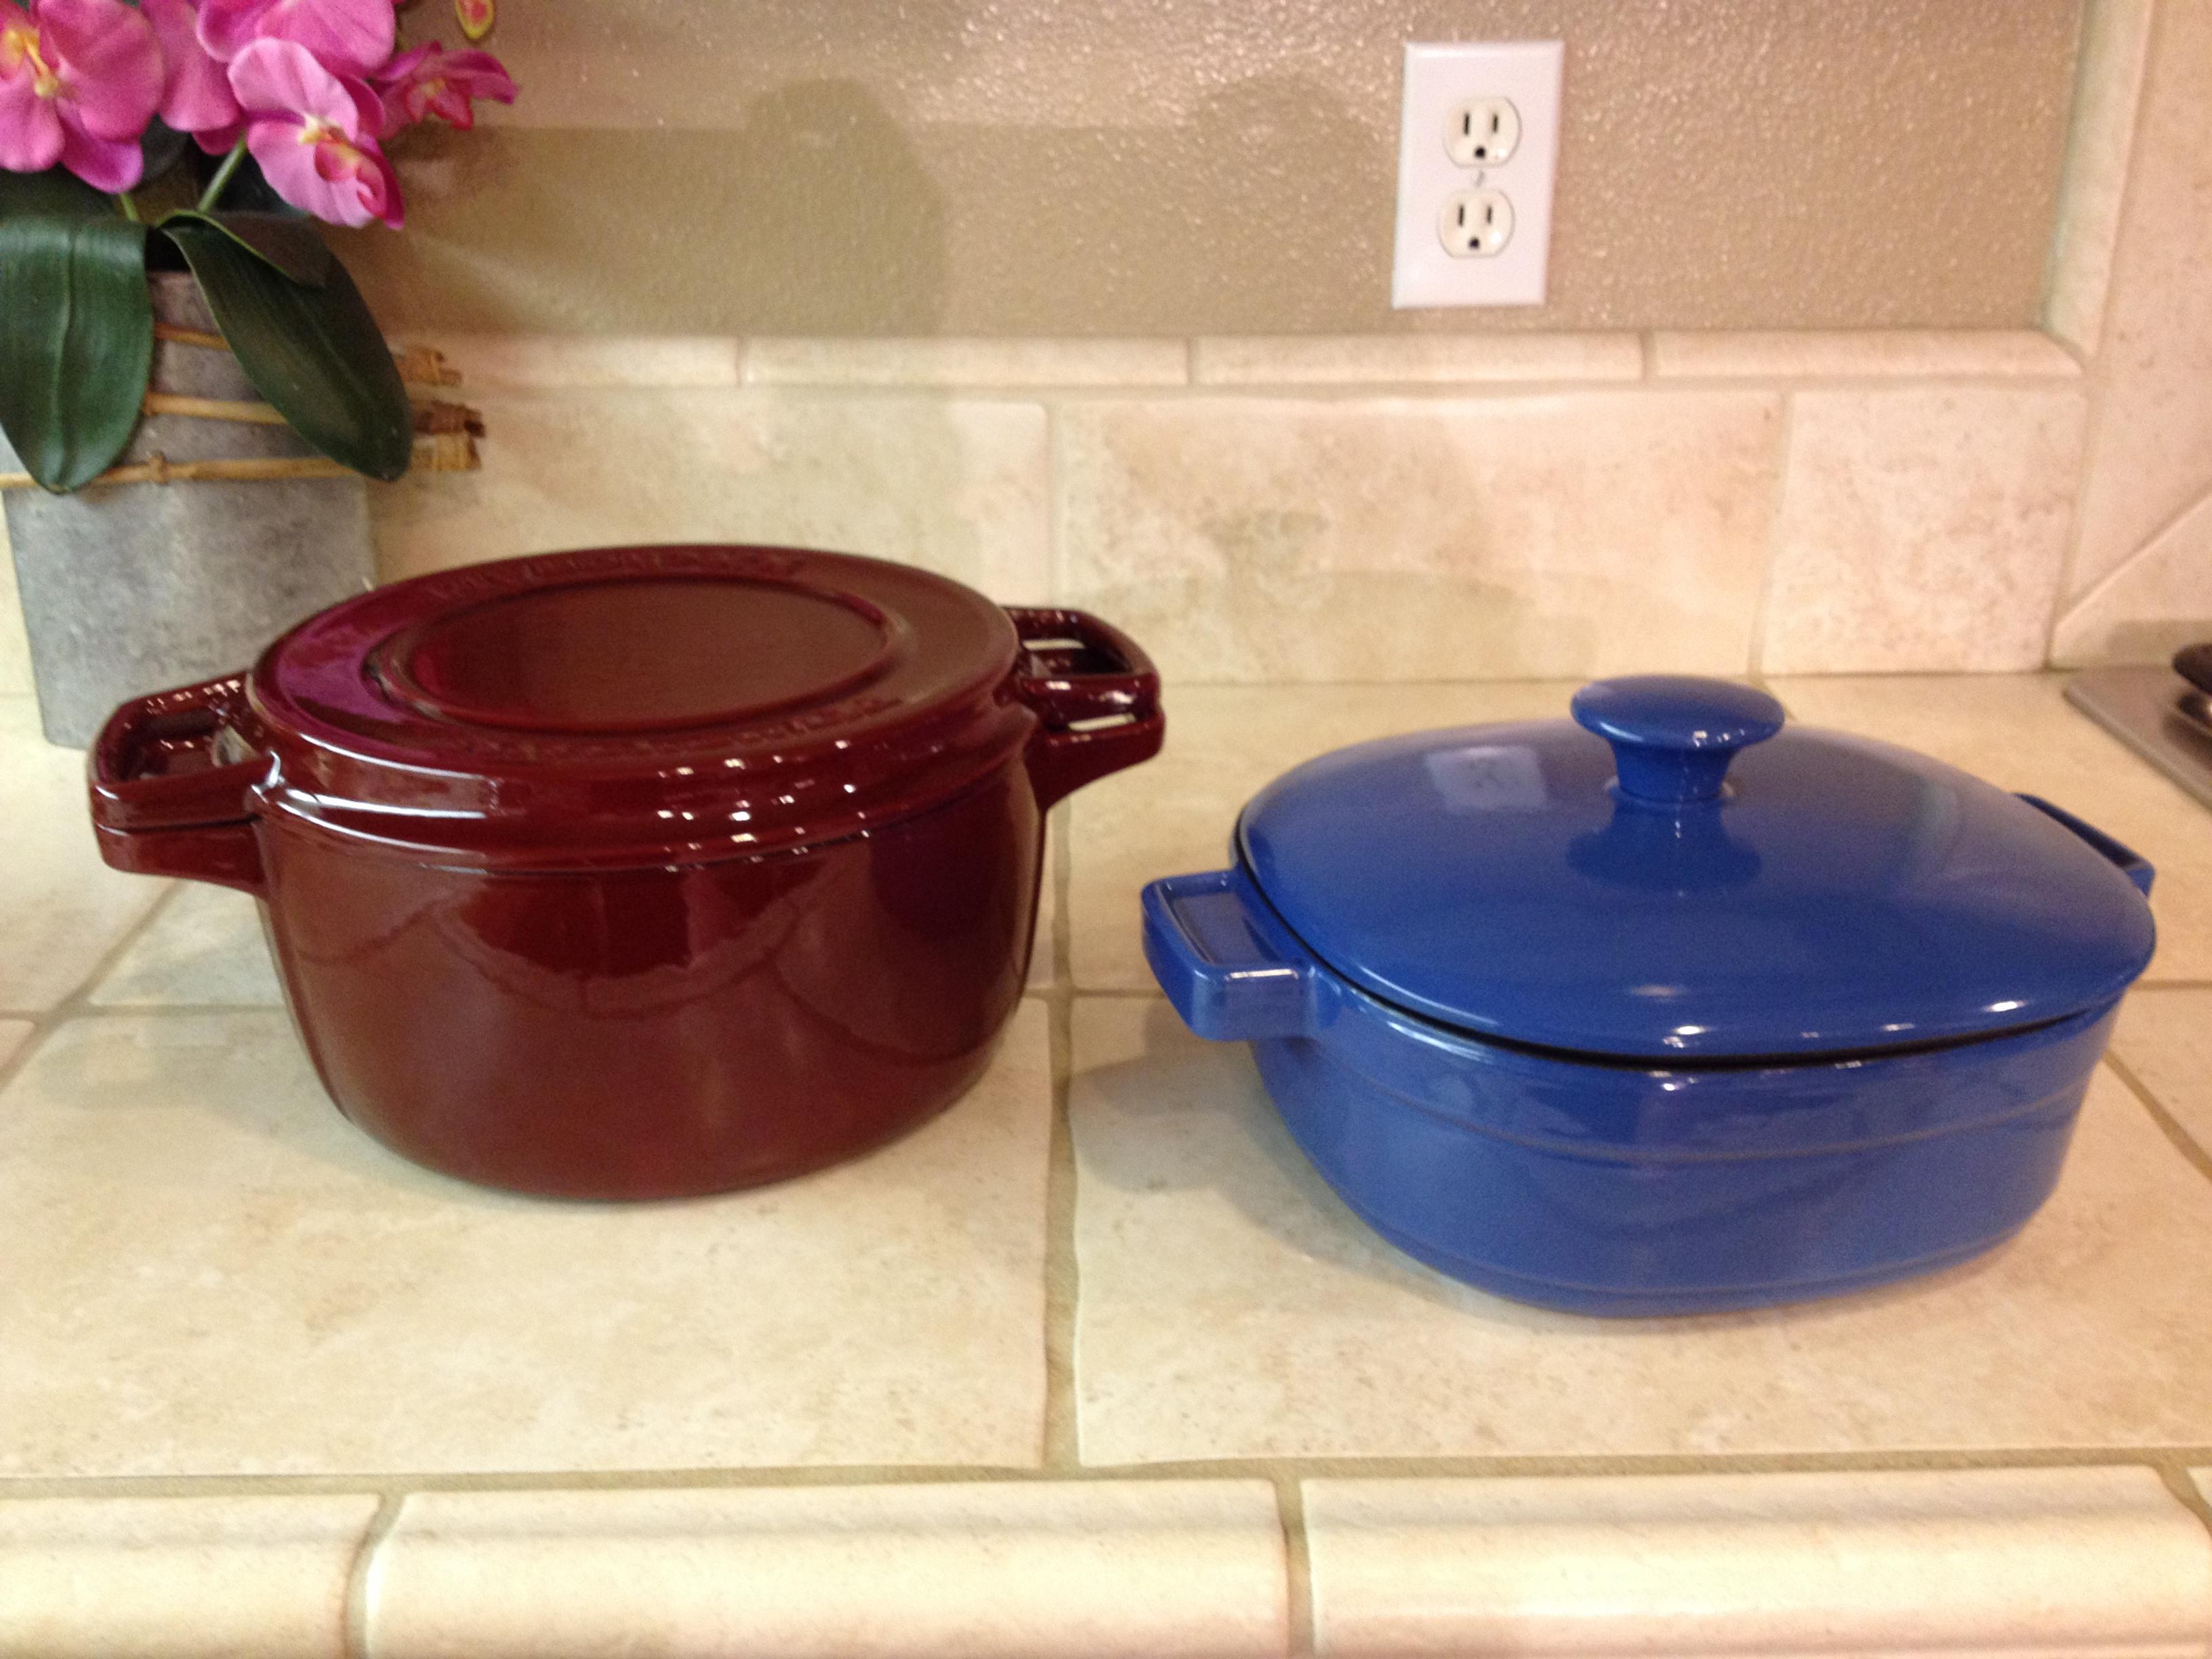 Superior KitchenAid® Cast Iron Casserole Cookware